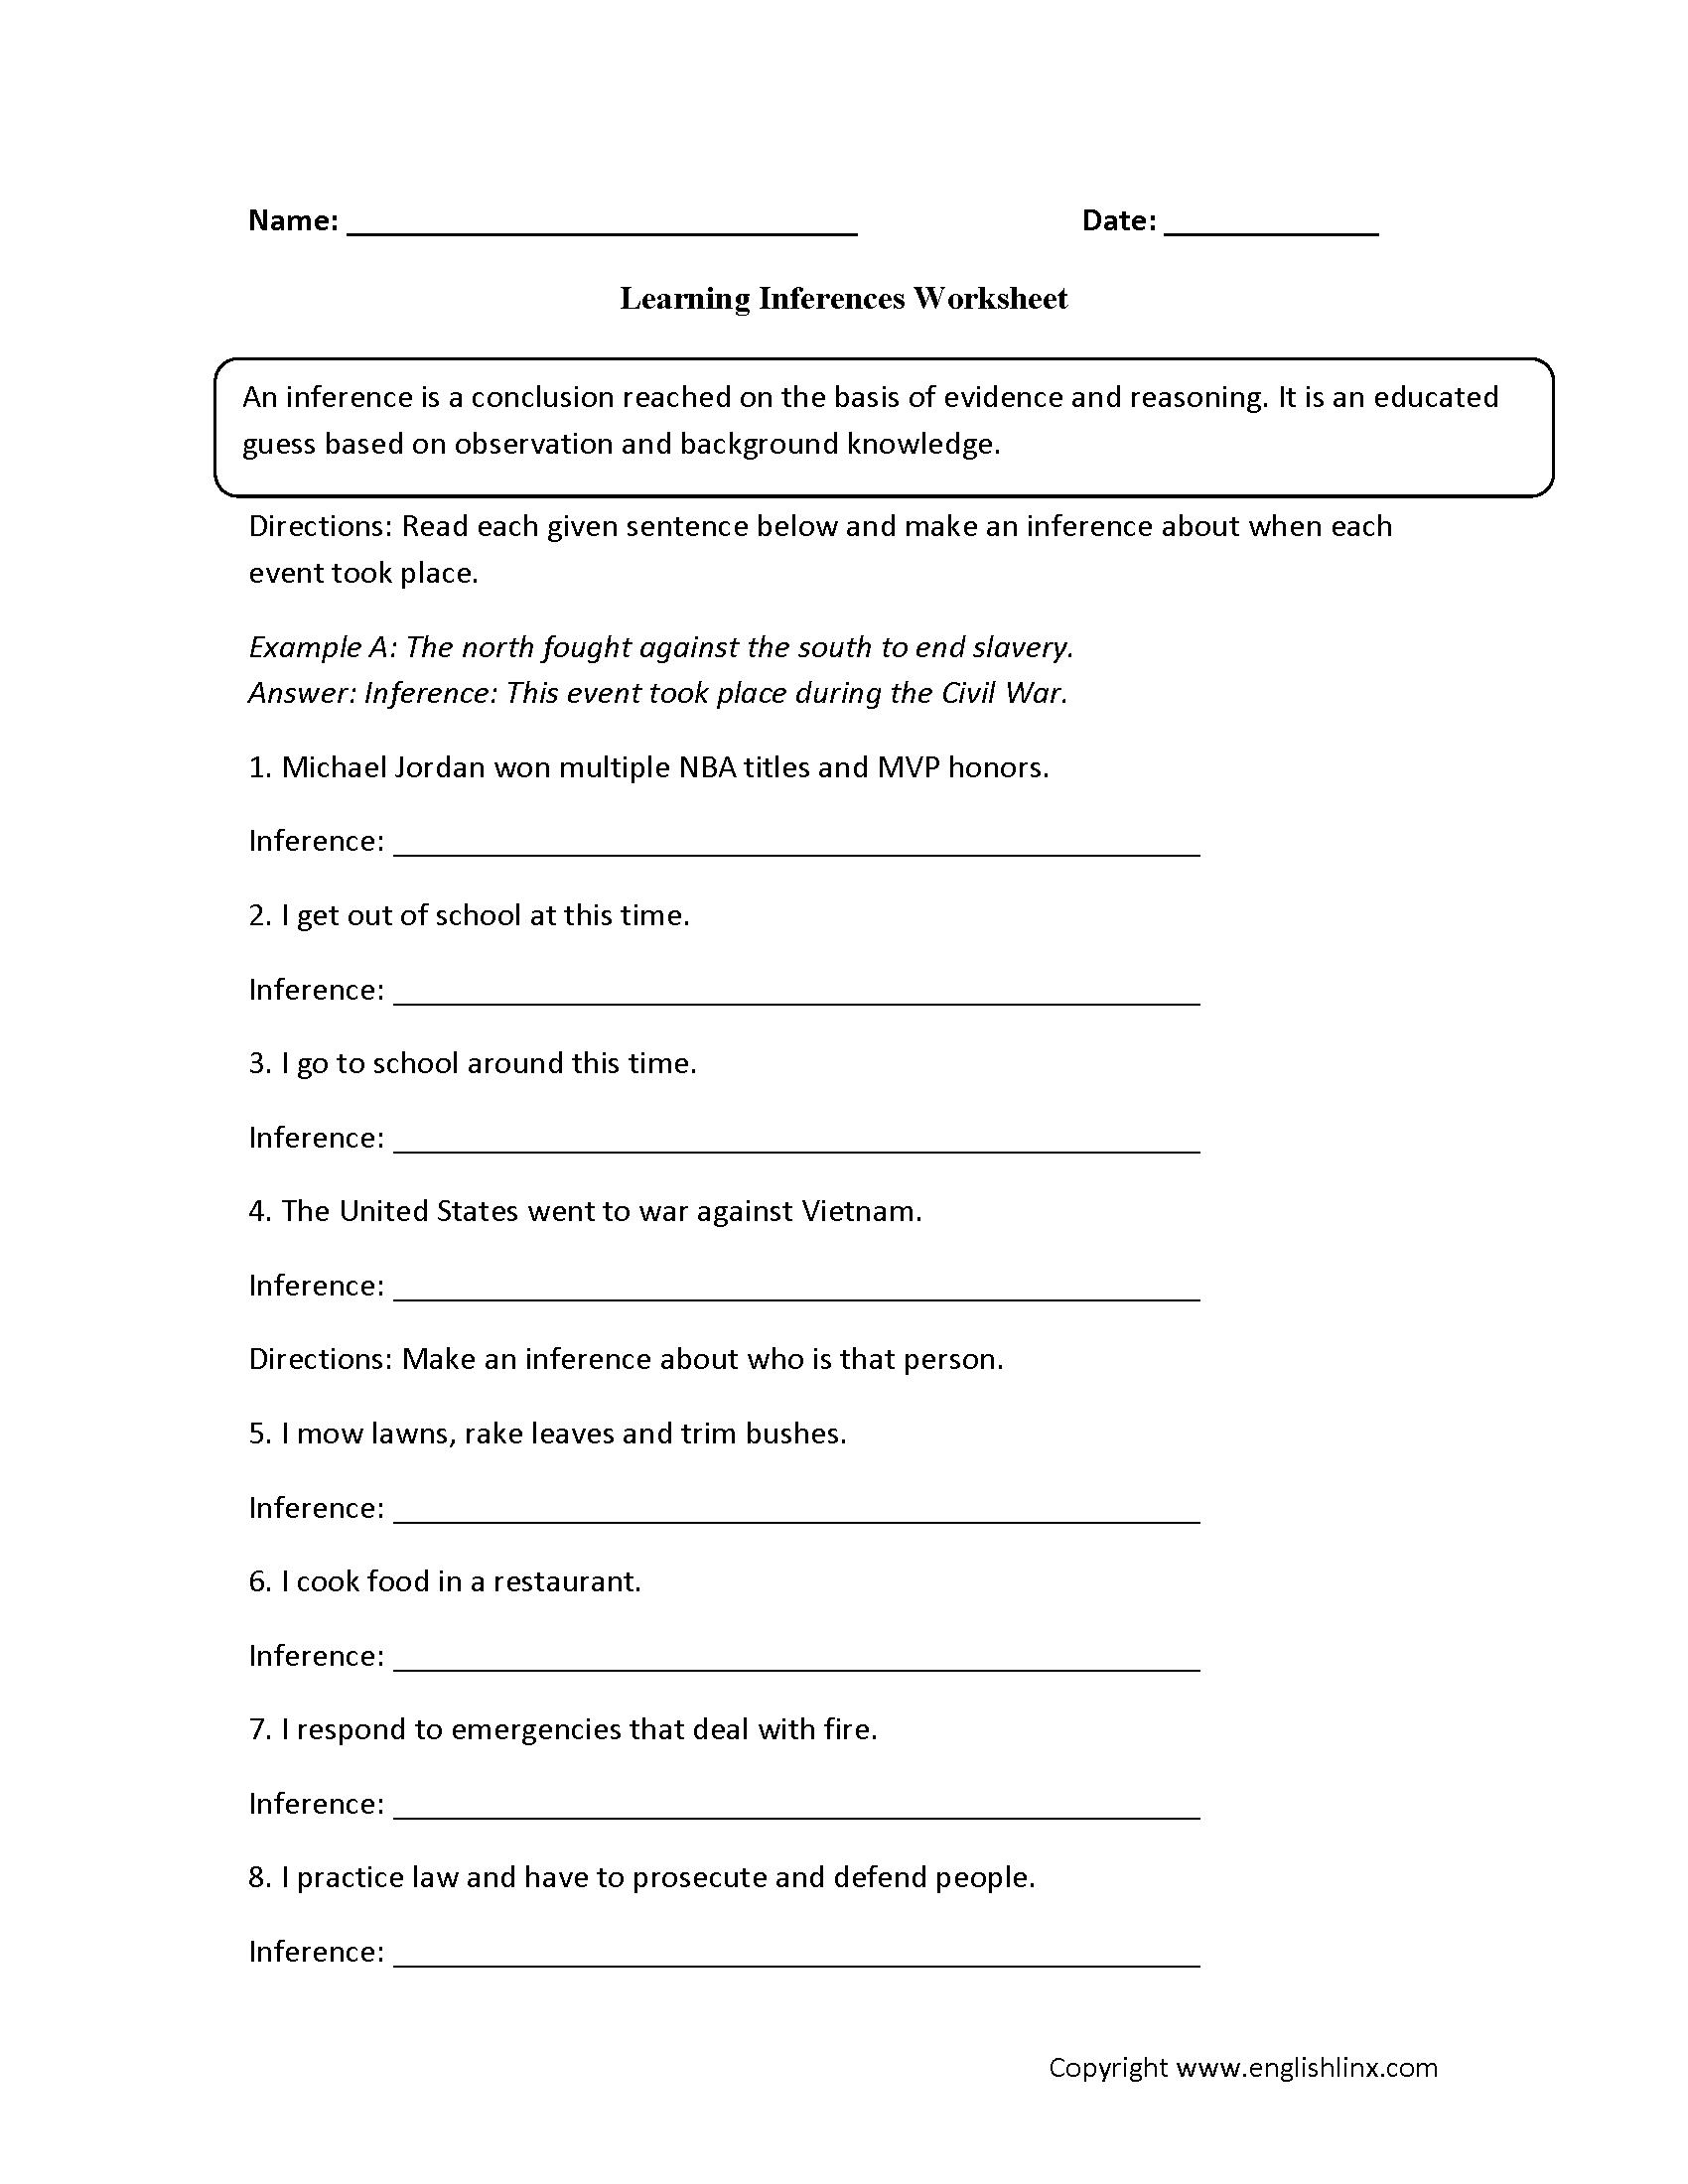 Learning Inference Worksheets Englishlinx Board – Observation Inference Worksheet